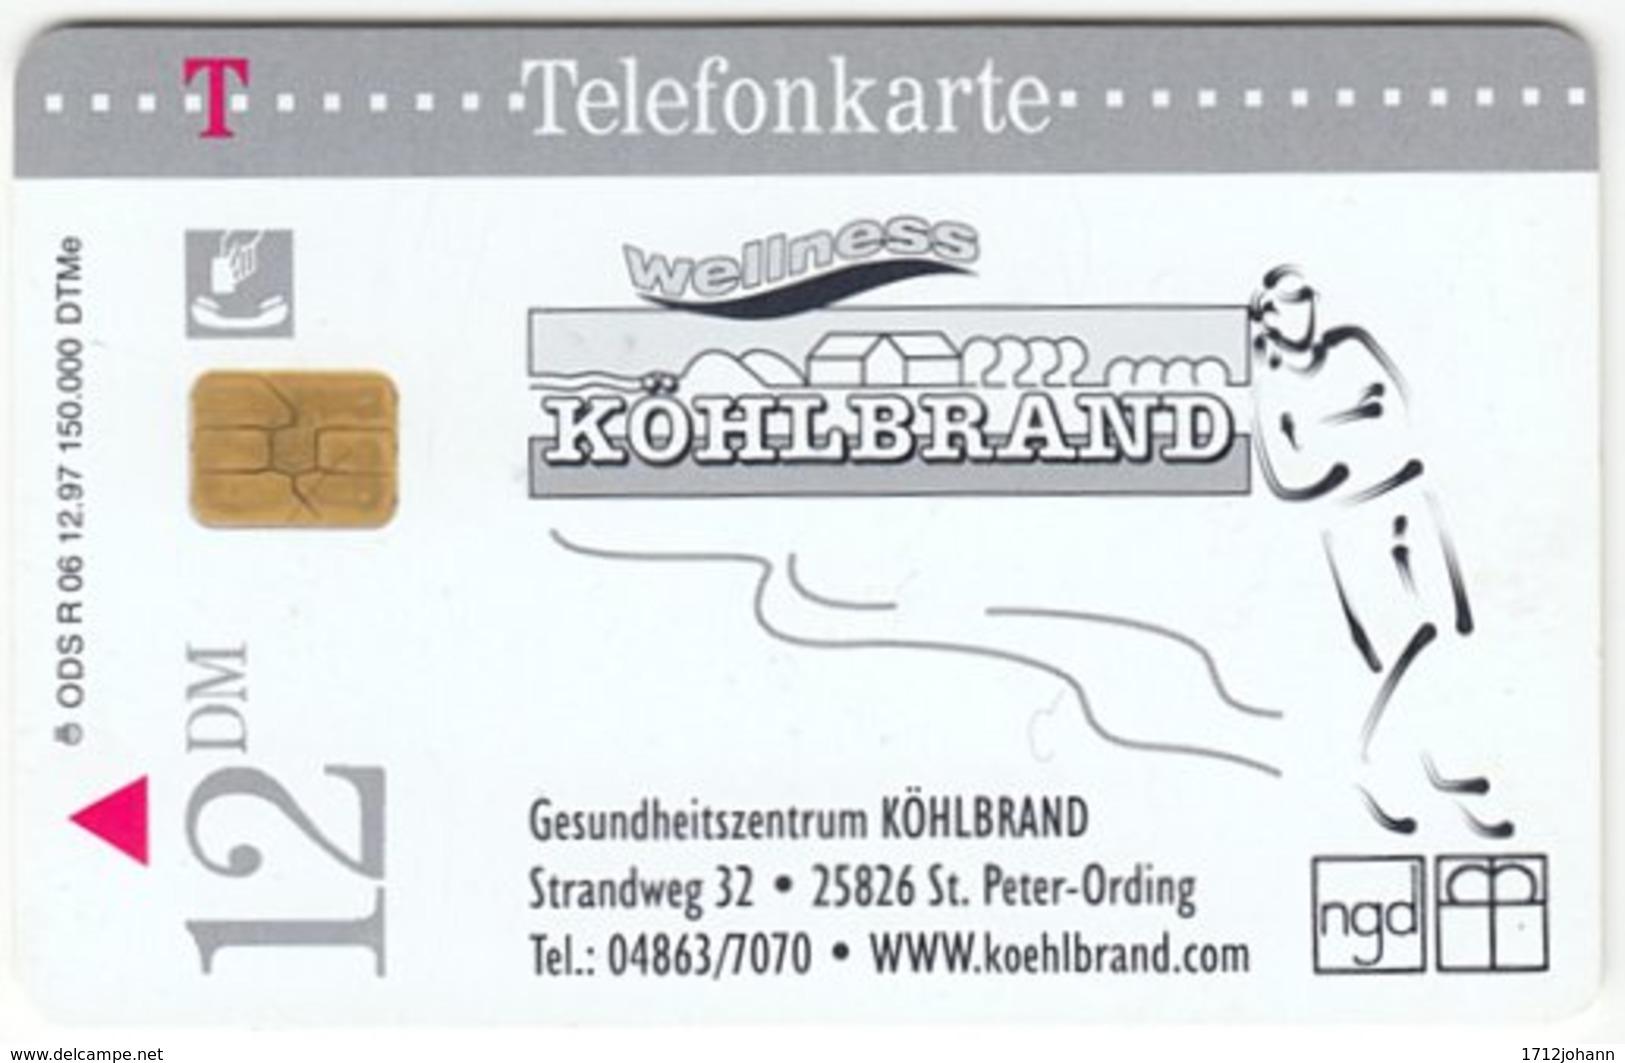 GERMANY R-Serie A-200 - 06 12.97 - Leisure, Wellness - Used - Deutschland